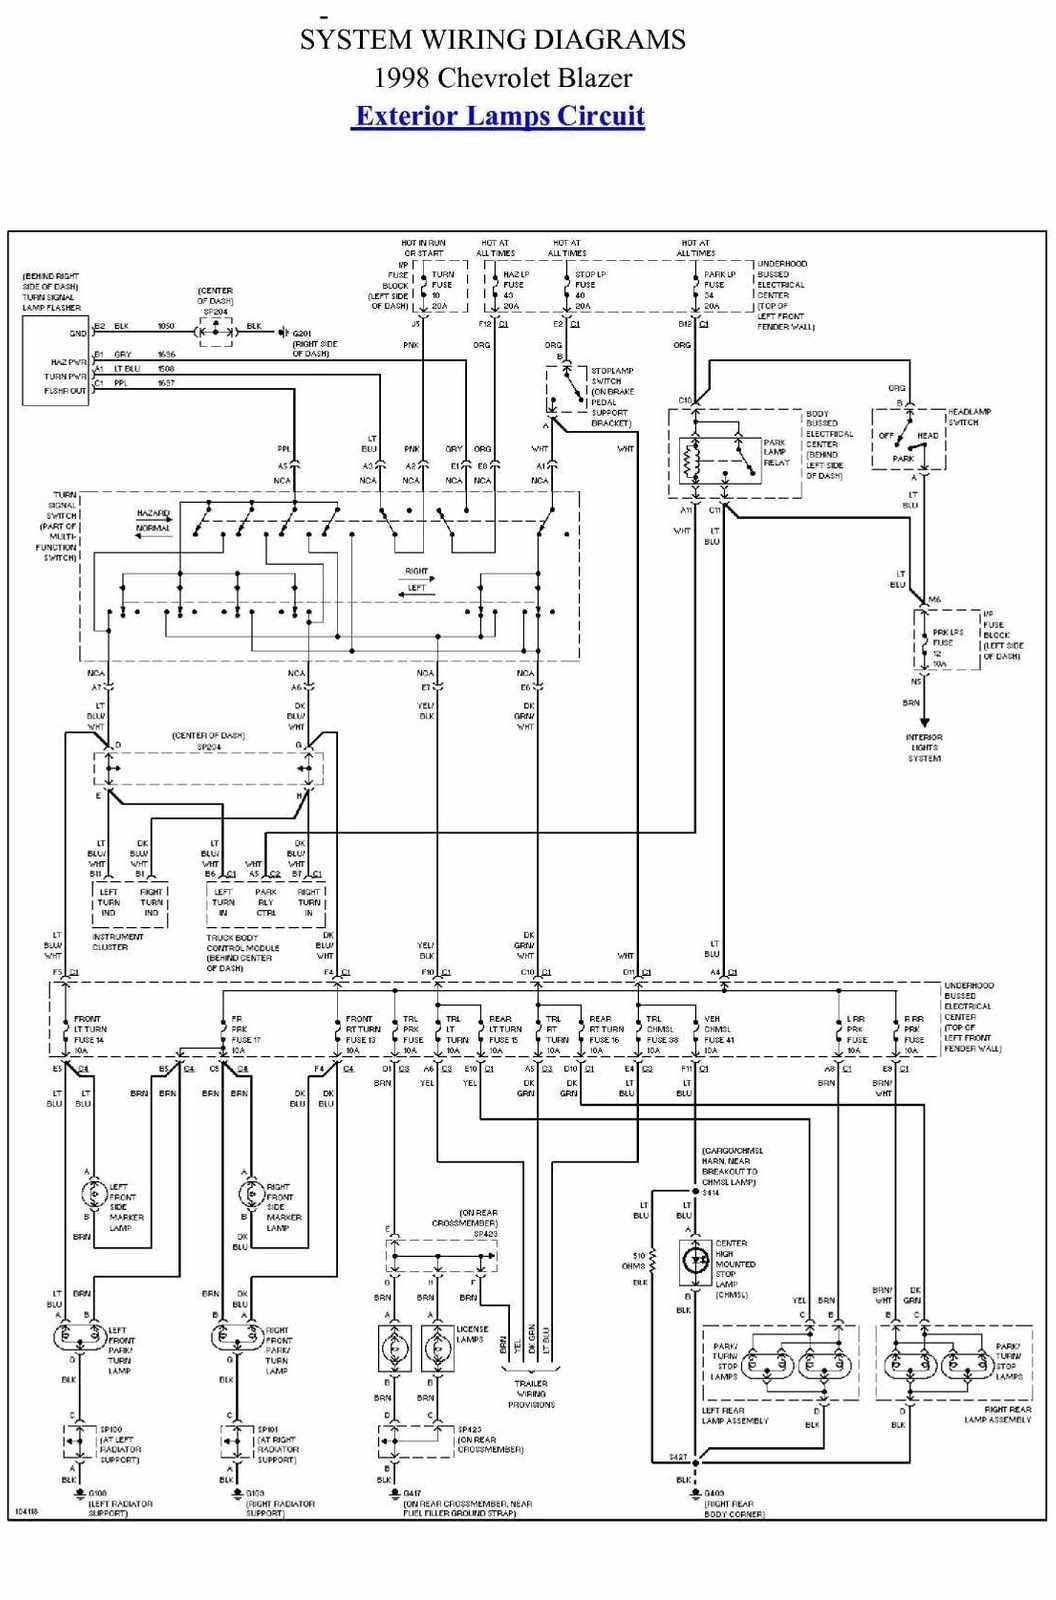 Exterior Lamp Circuit Diagram Of Chevrolet Blazer